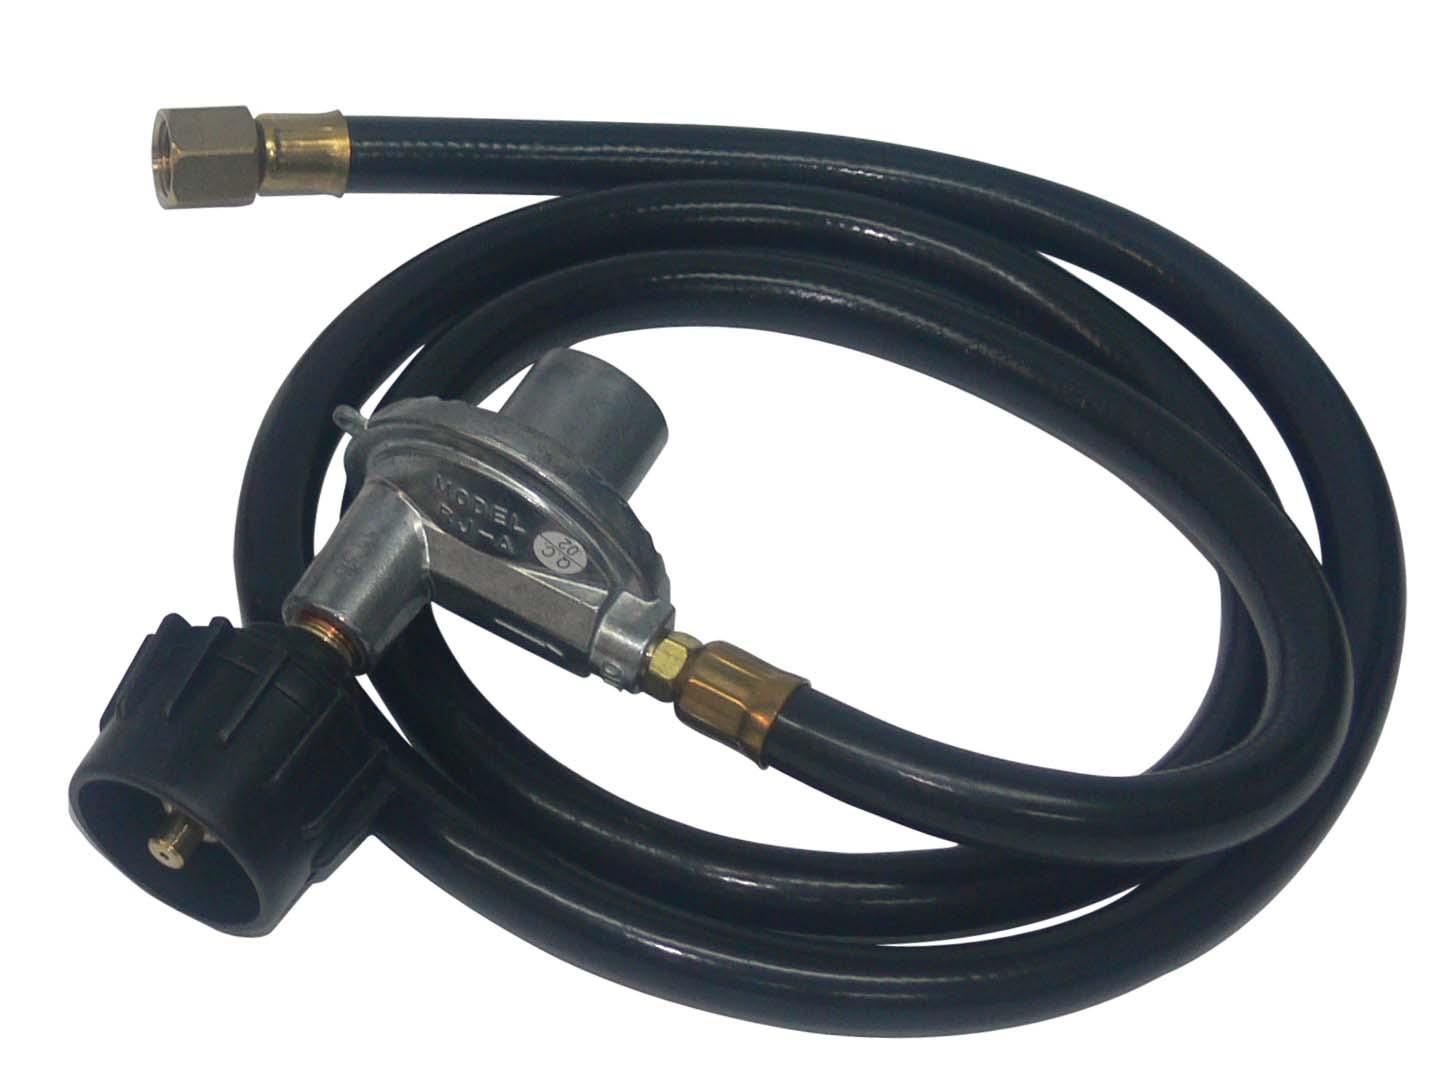 fire pit connection kits burner pan connection kits discount